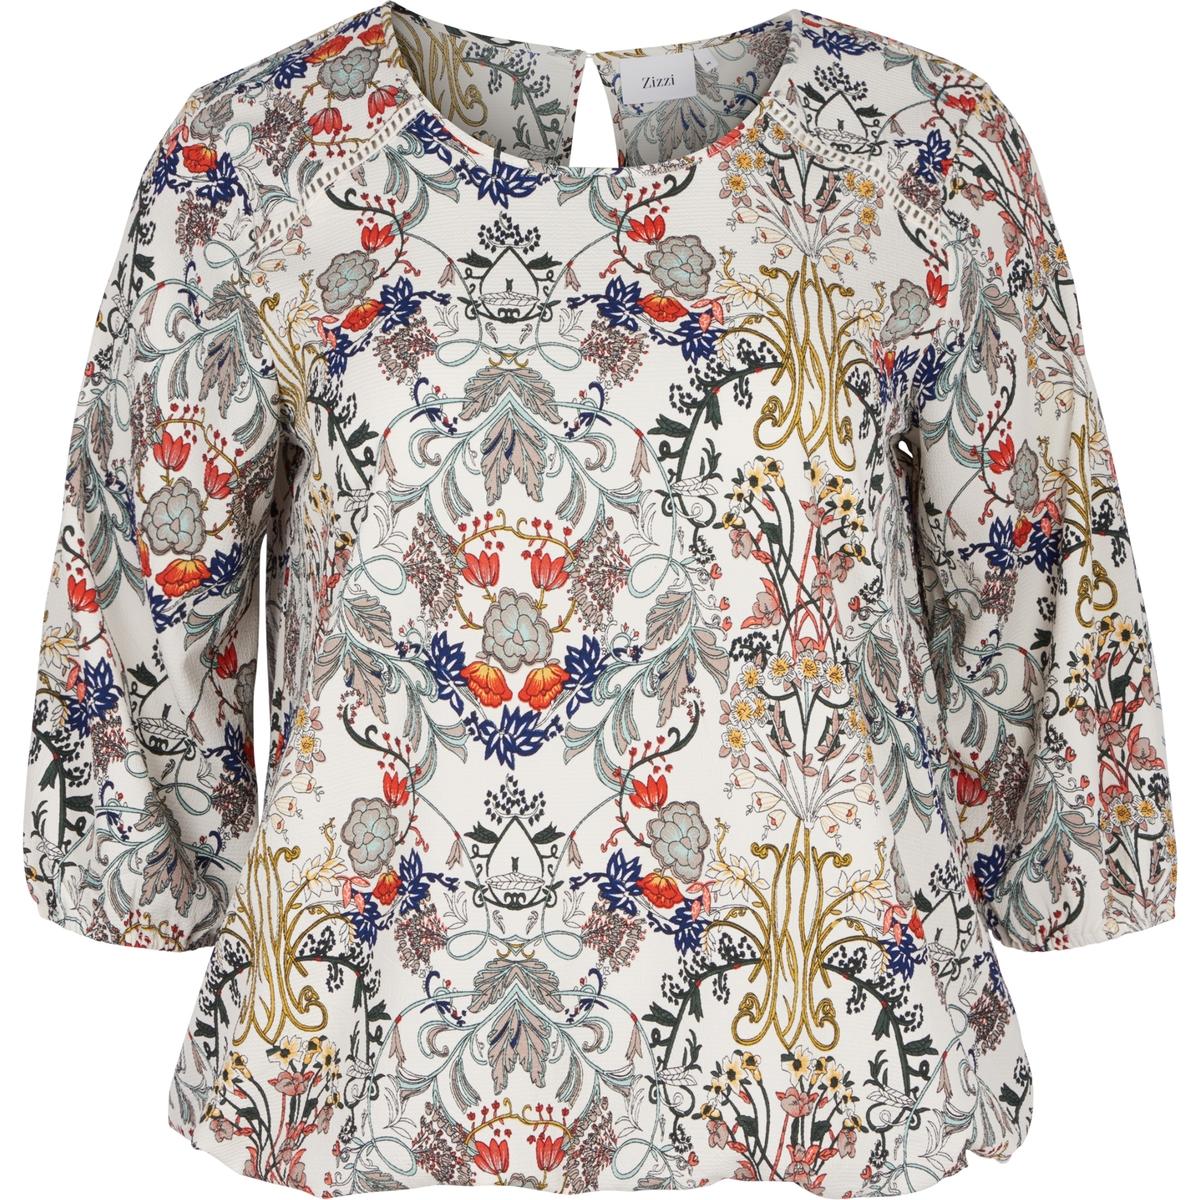 Блузка ZIZZIБлузка ZIZZI. Блузка с рисунком. Рукава 3/4. 98% полиэстера, 2% эластана.<br><br>Цвет: рисунок/белый<br>Размер: 50/52 (FR) - 56/58 (RUS)